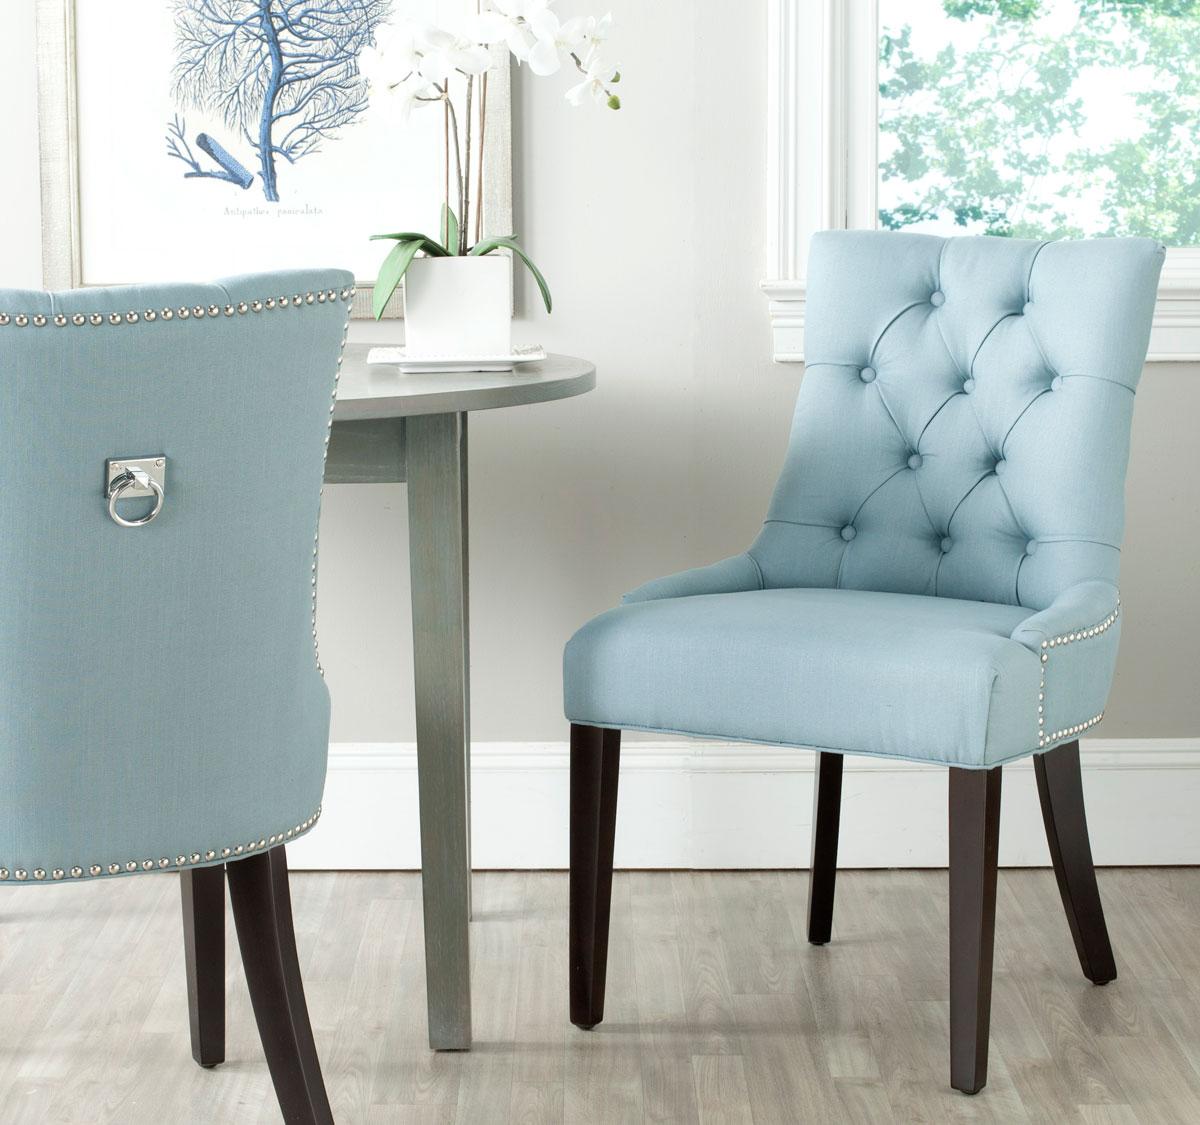 MCR4716E-SET2 Dining Chairs - Furniture by Safavieh  Safavieh